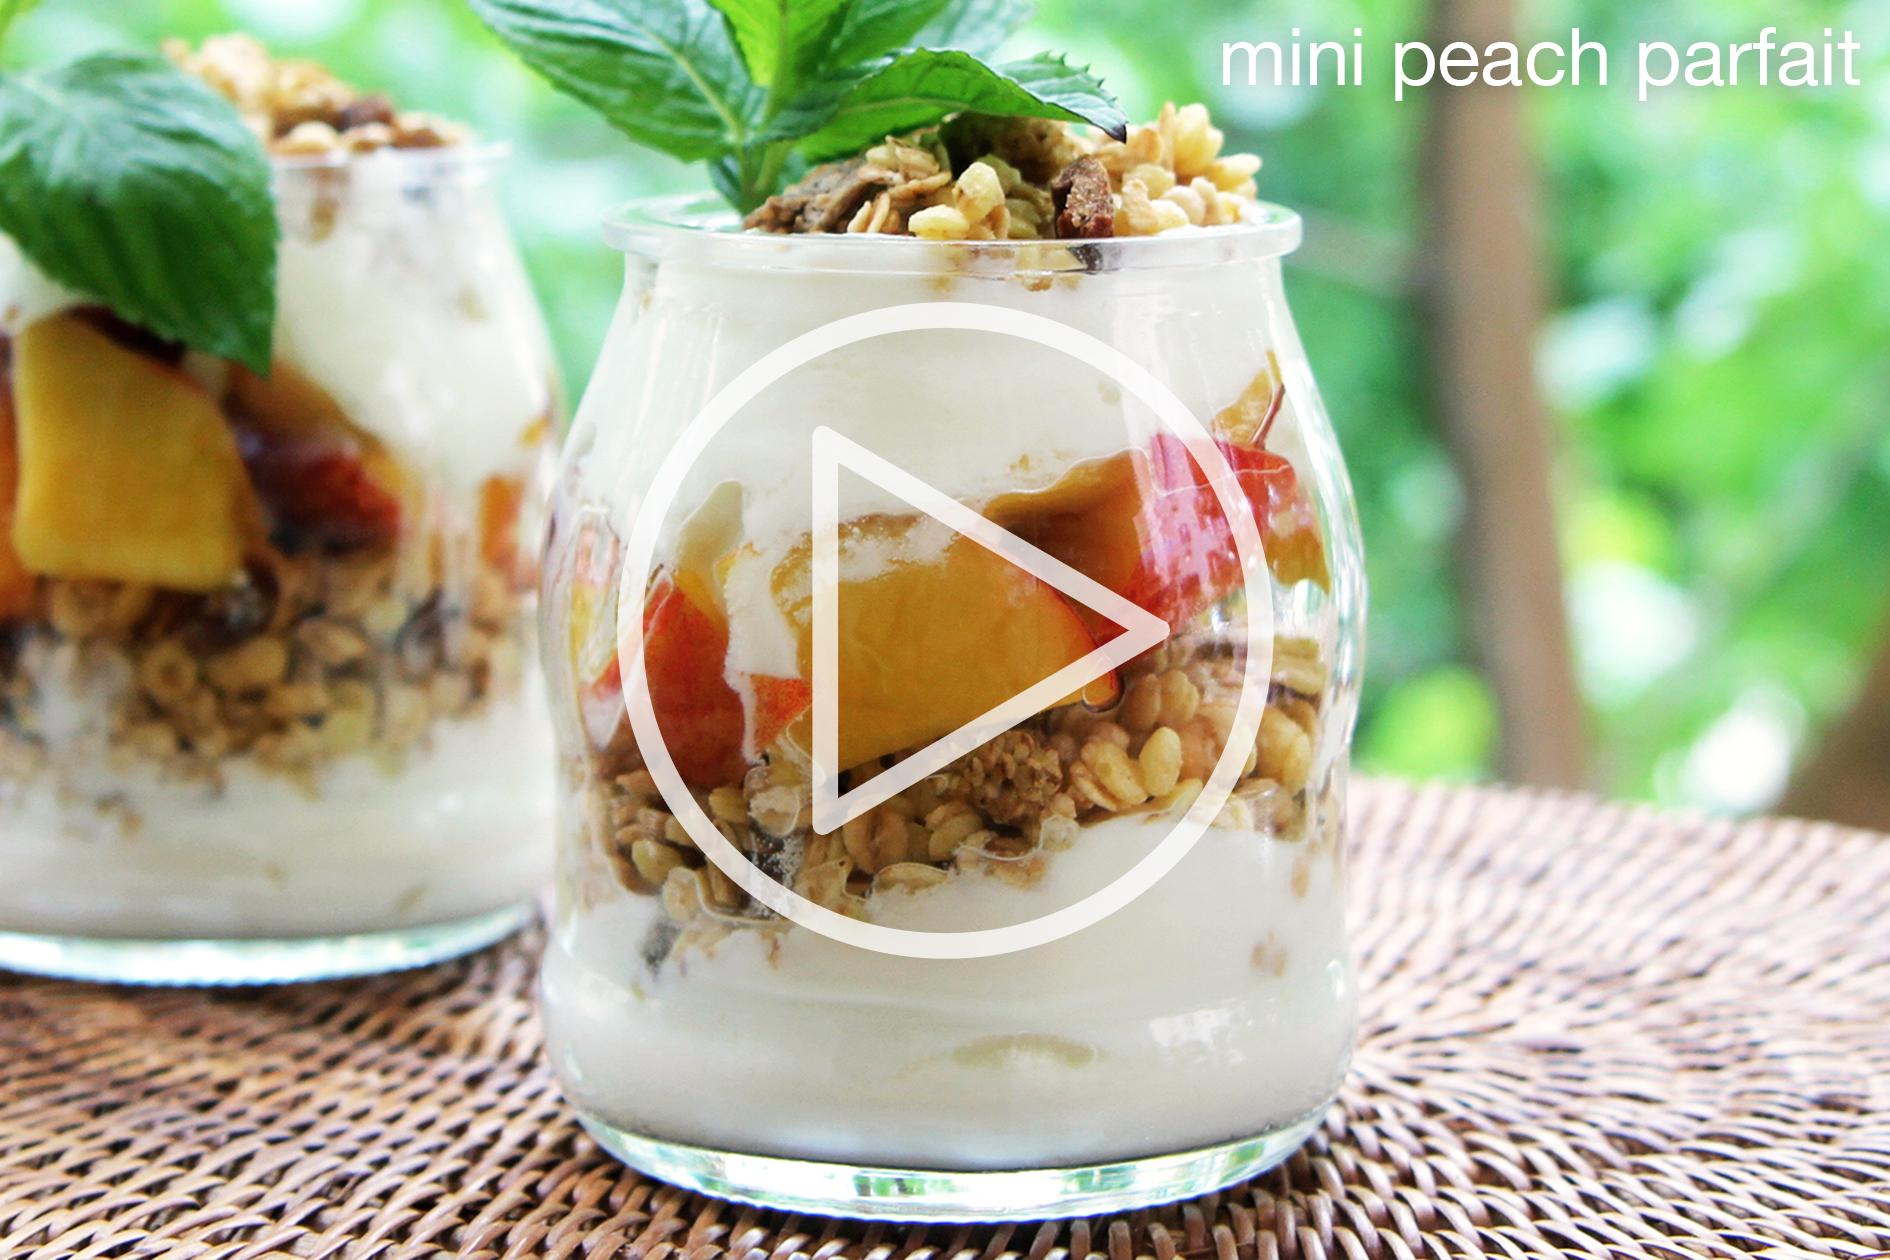 peach-parfait-featured-image-video